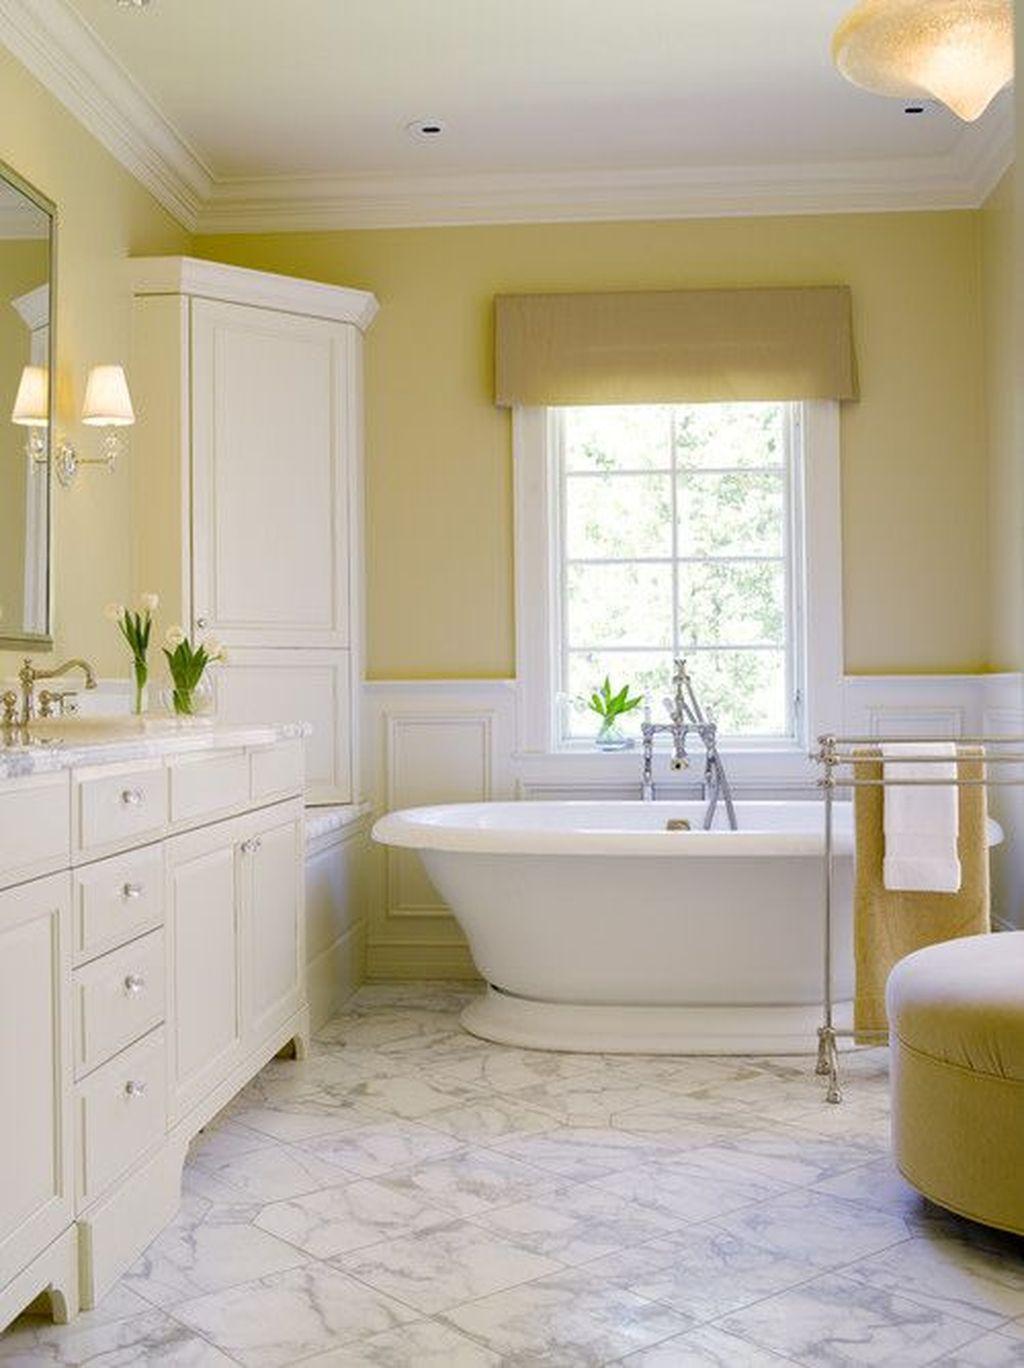 Creative Sunny Yellow Bathroom Decor For Summer 34